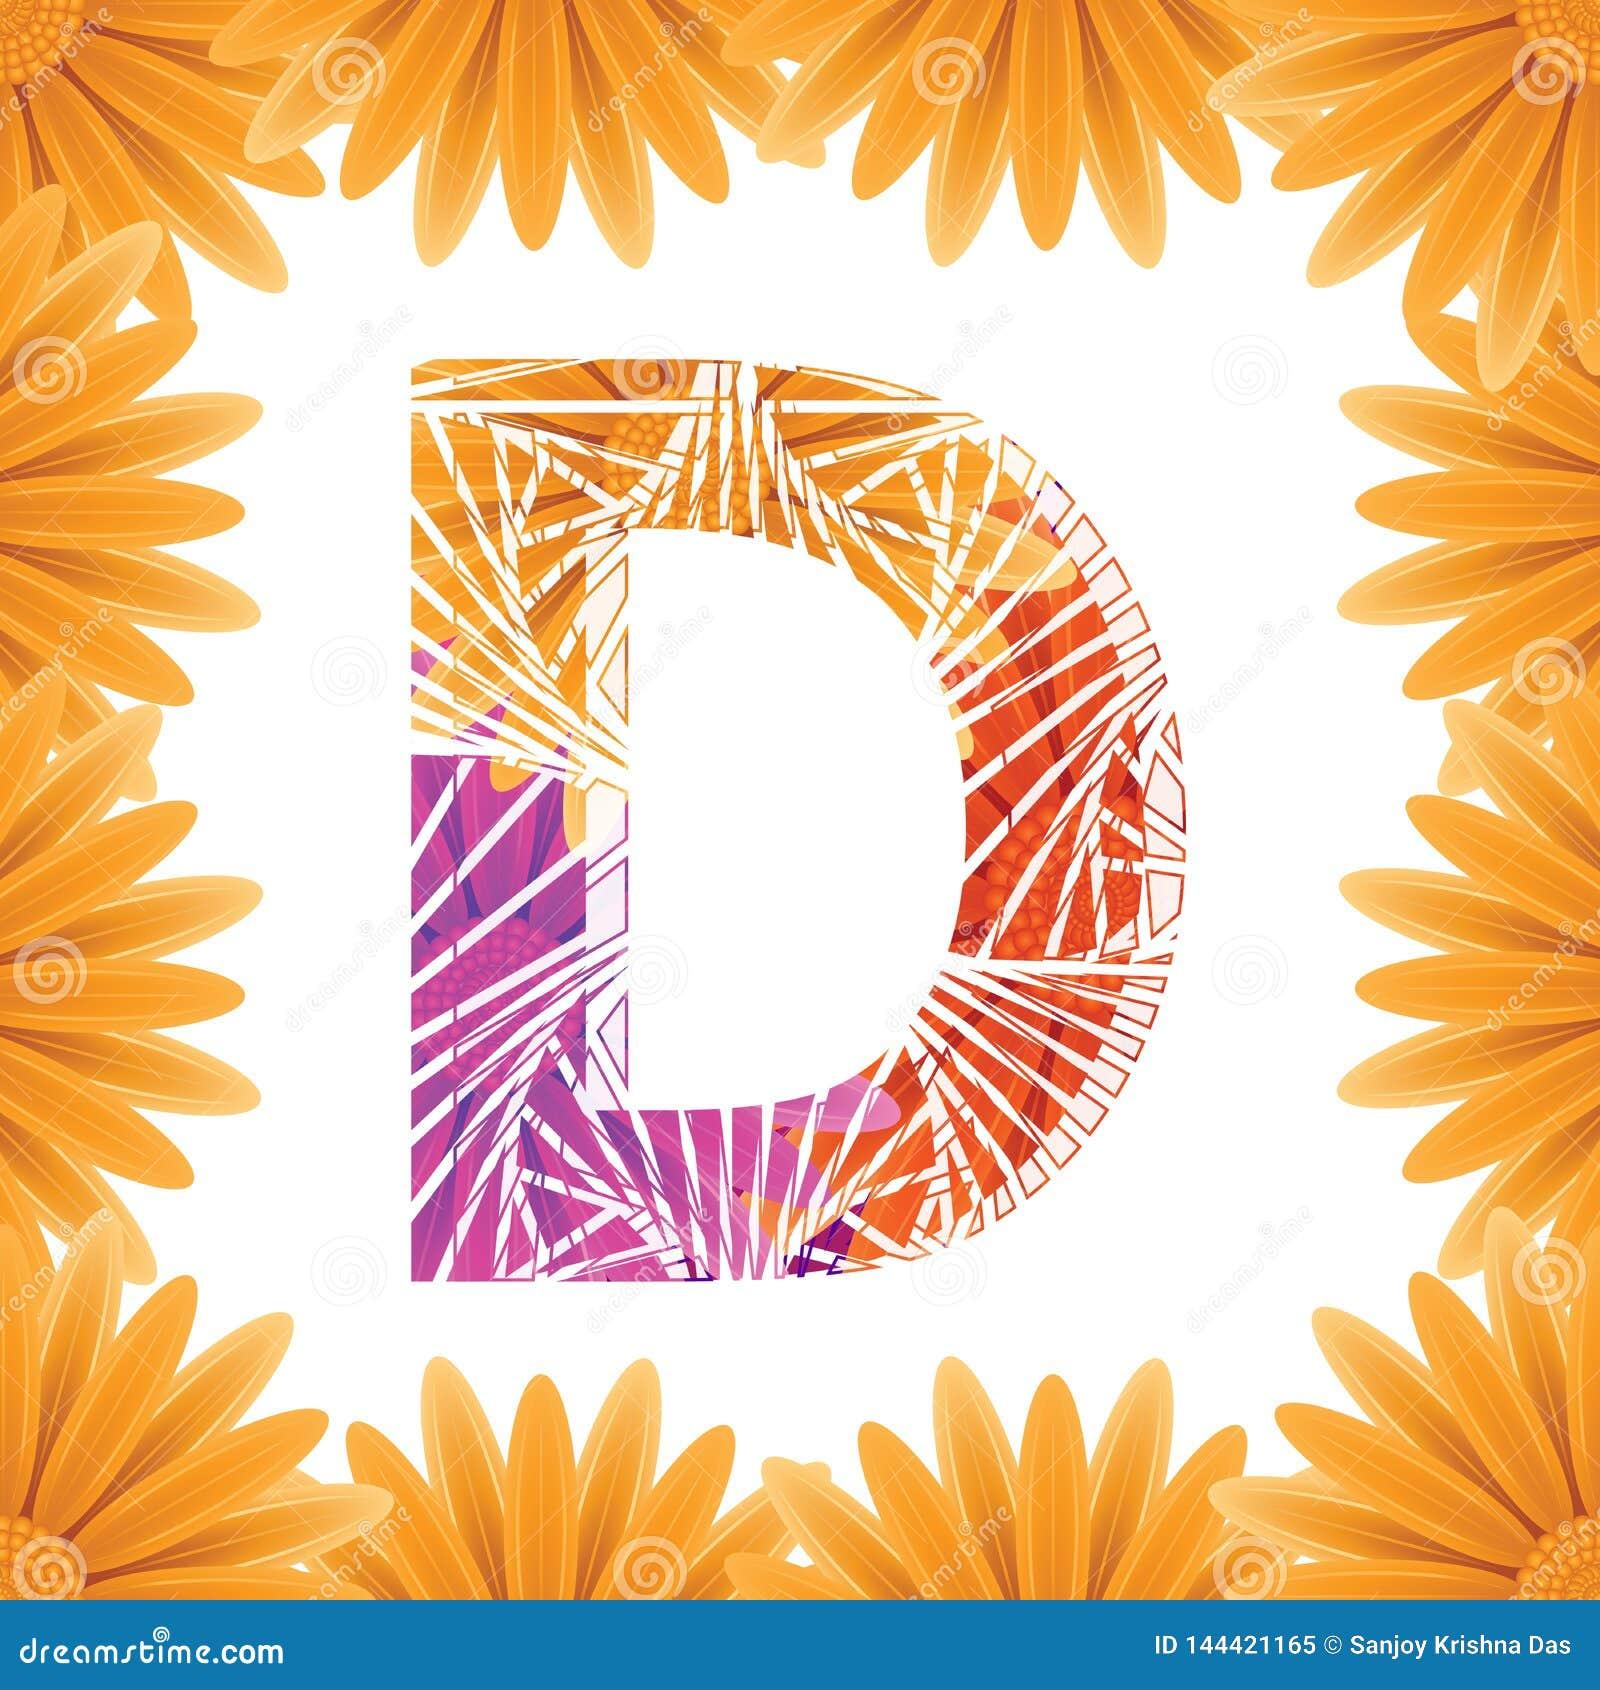 Floral Letter D design template. Mother's Das flower logo type design concept of Abstract alphabet logo